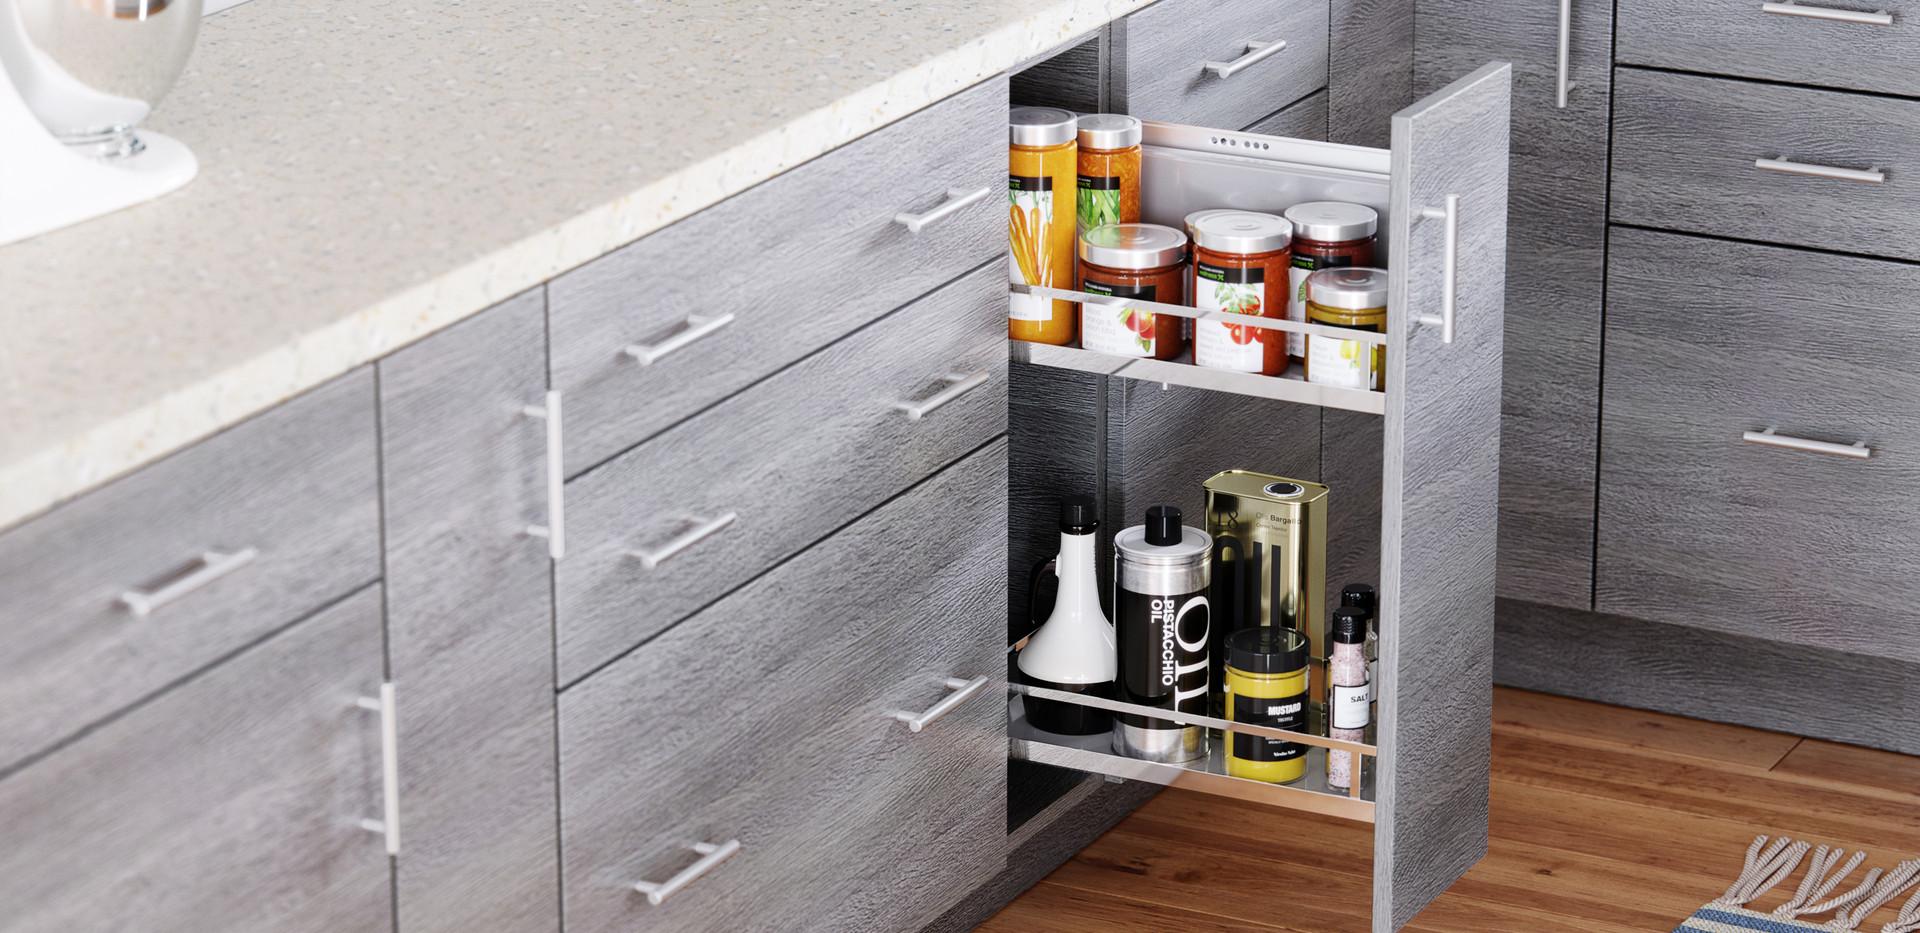 MGW Kitchen Close-Up (UB09 Tray).jpg